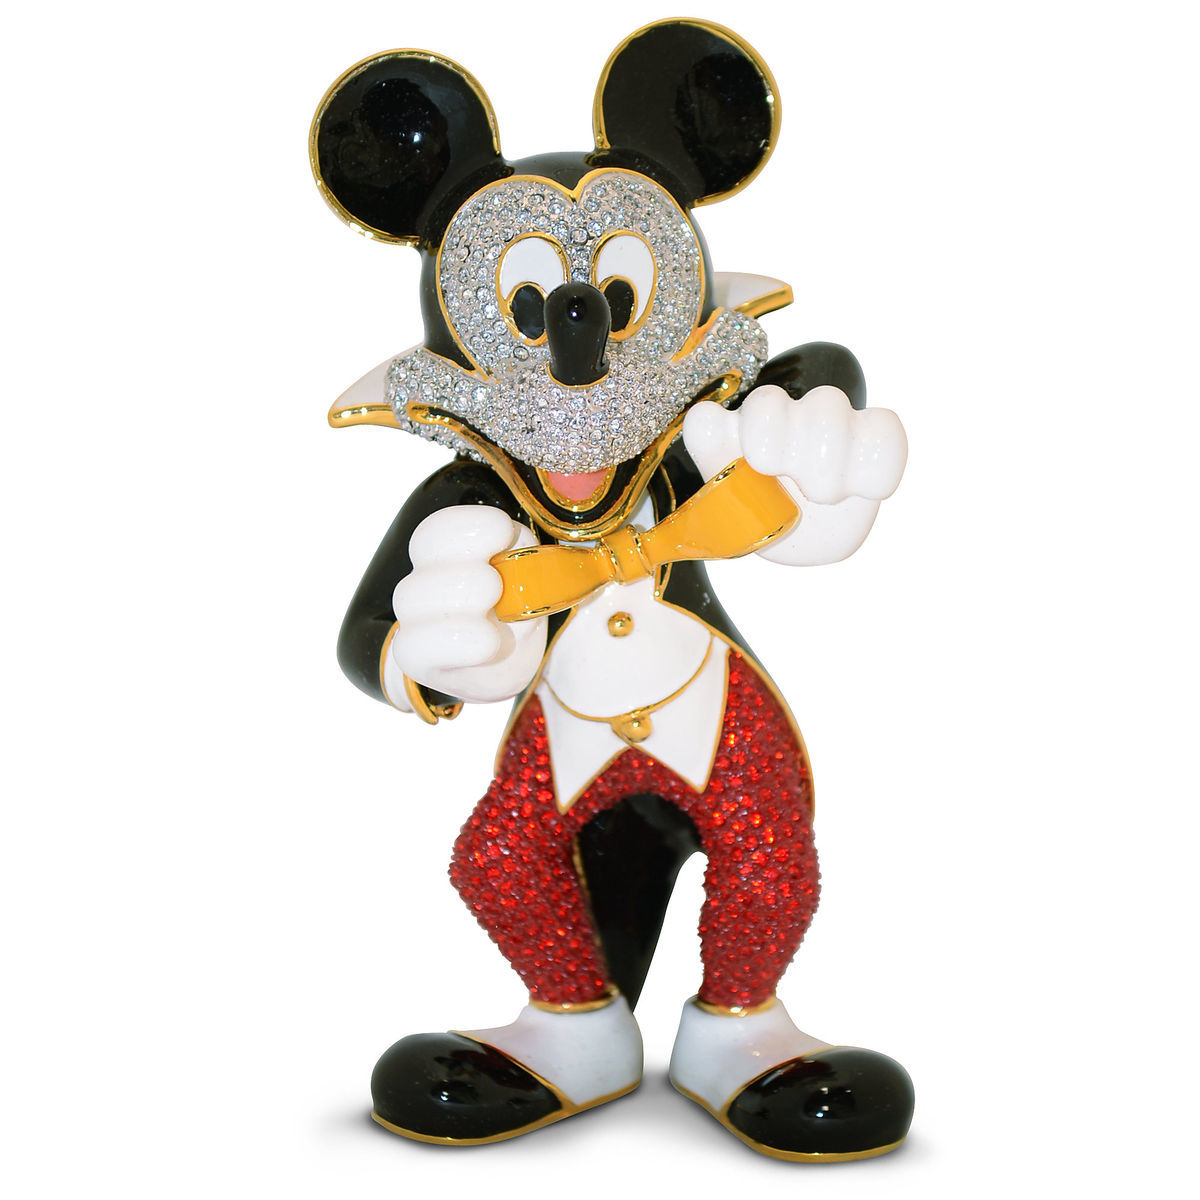 Tuxedo Mickey Mouse Jeweled Figurine by Arribas   shopDisney